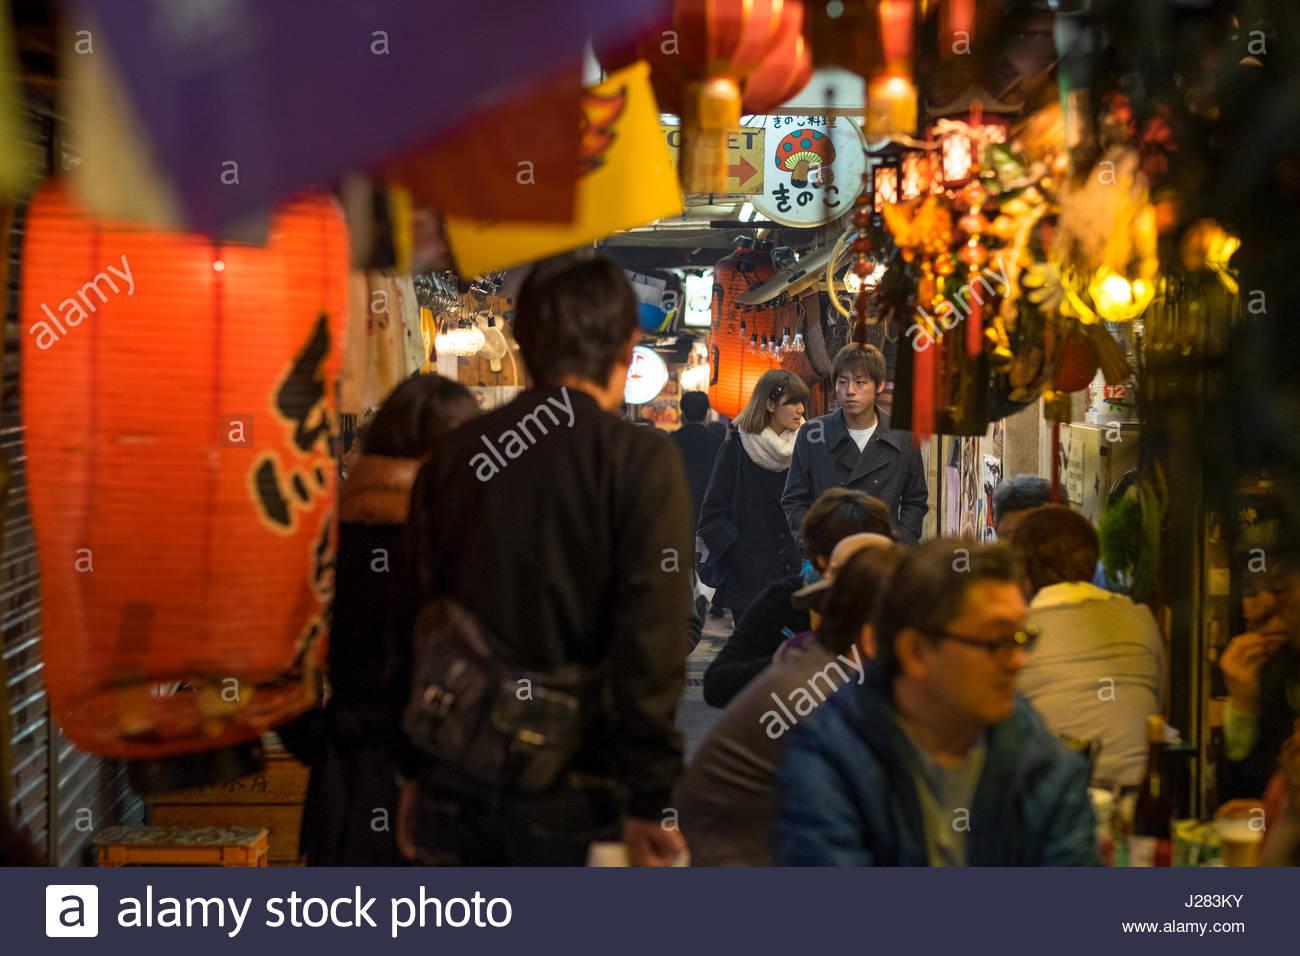 People walking in Ebisu Yokocho an izakaya arcade, Ebisu, Shibuya, Tokyo, Honshu, Japan Stock Photo